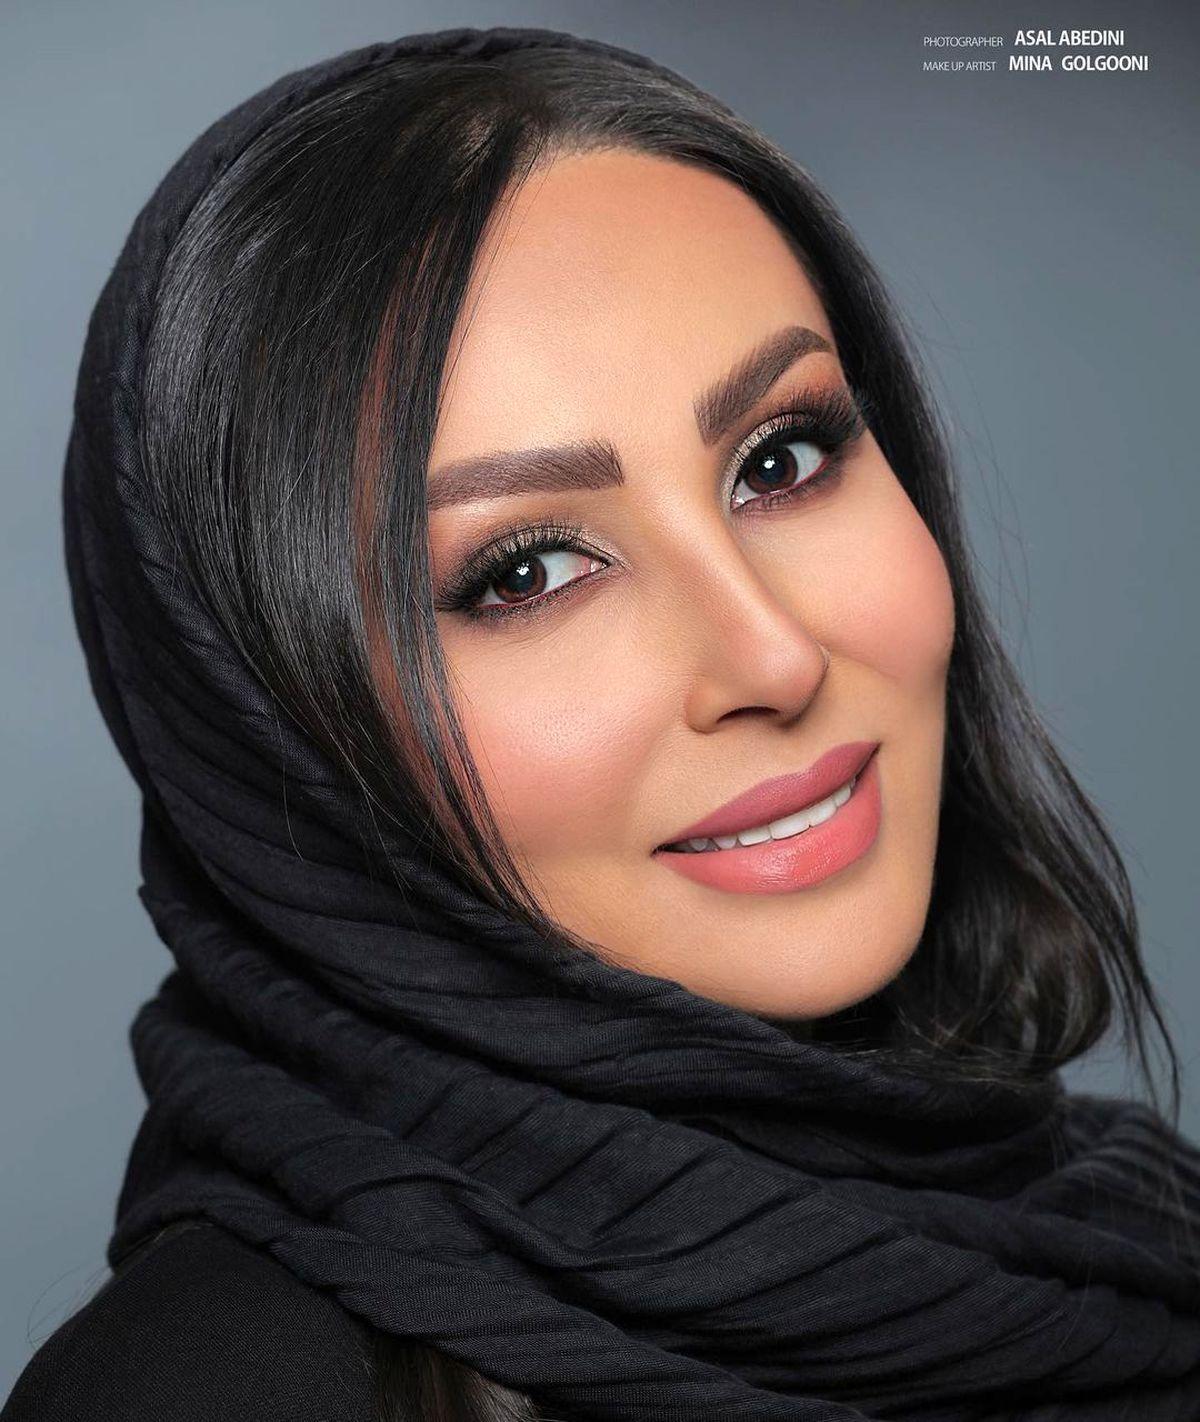 ویدیو اعتراف تلخ پرستو صالحی درباره دلیل مهاجرتش   «دیگر دغدغه حجاب ندارم»